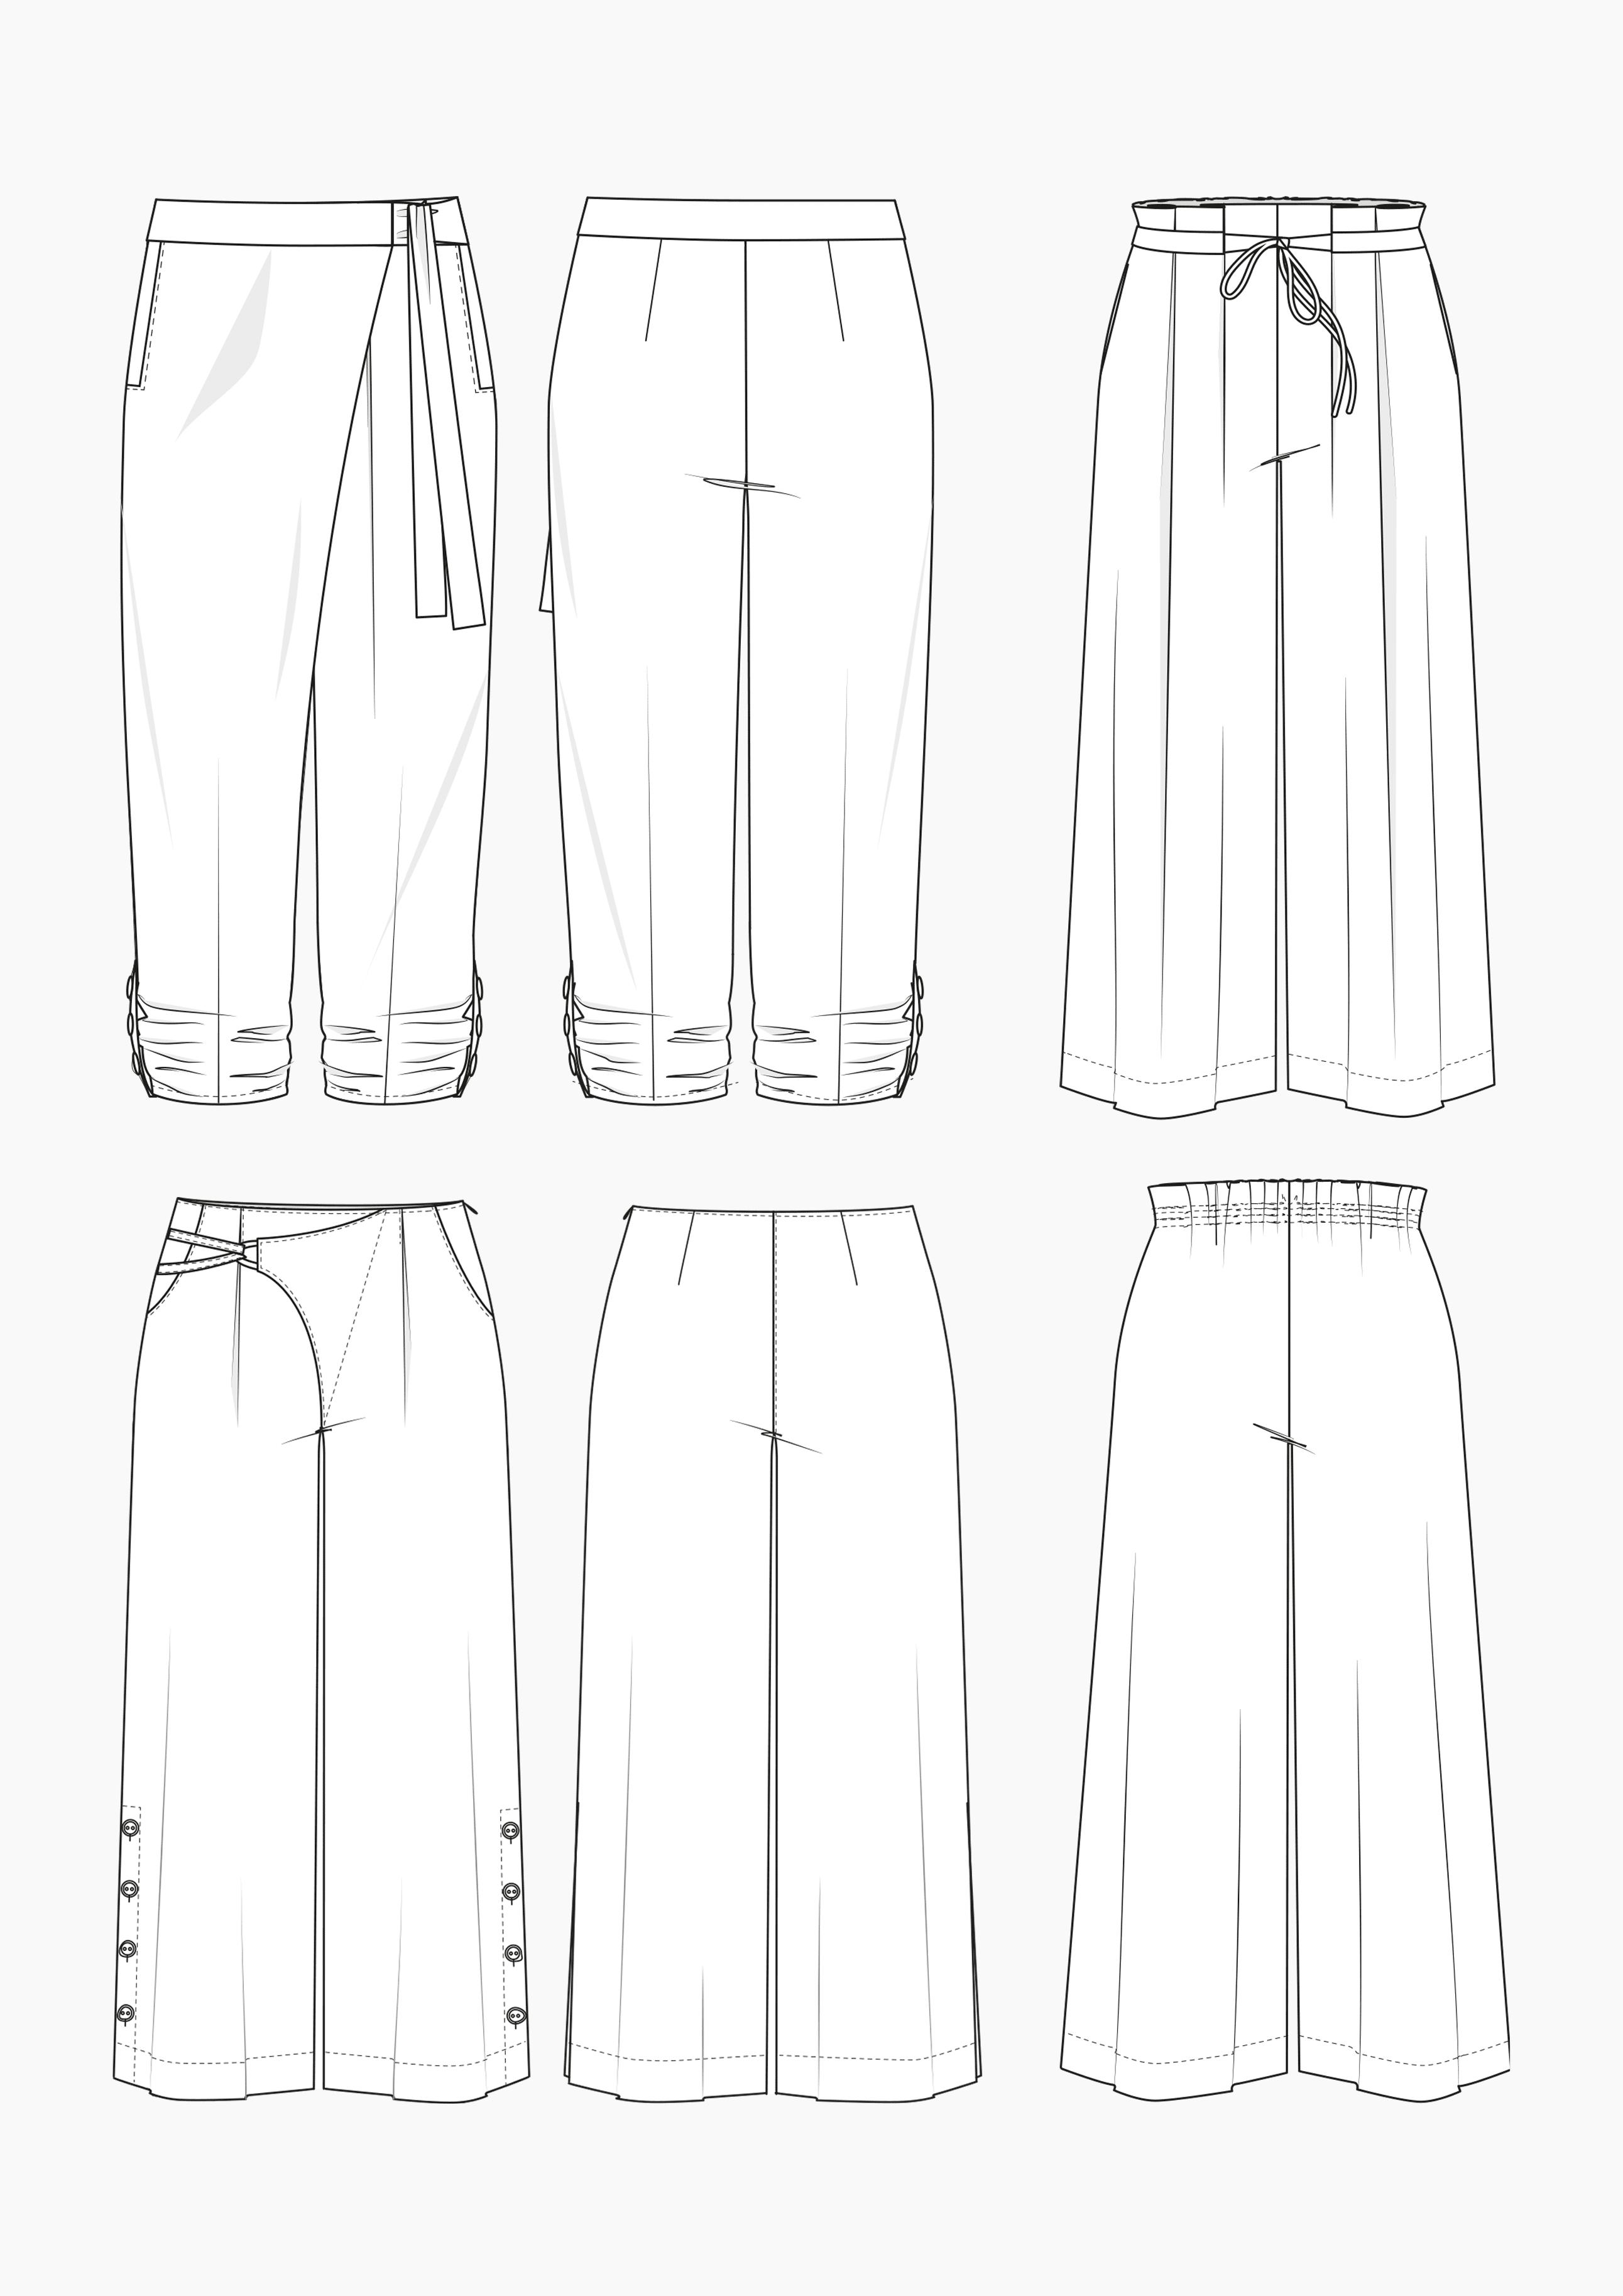 Produkt: Schnitt-Technik Hosen in großen Größen